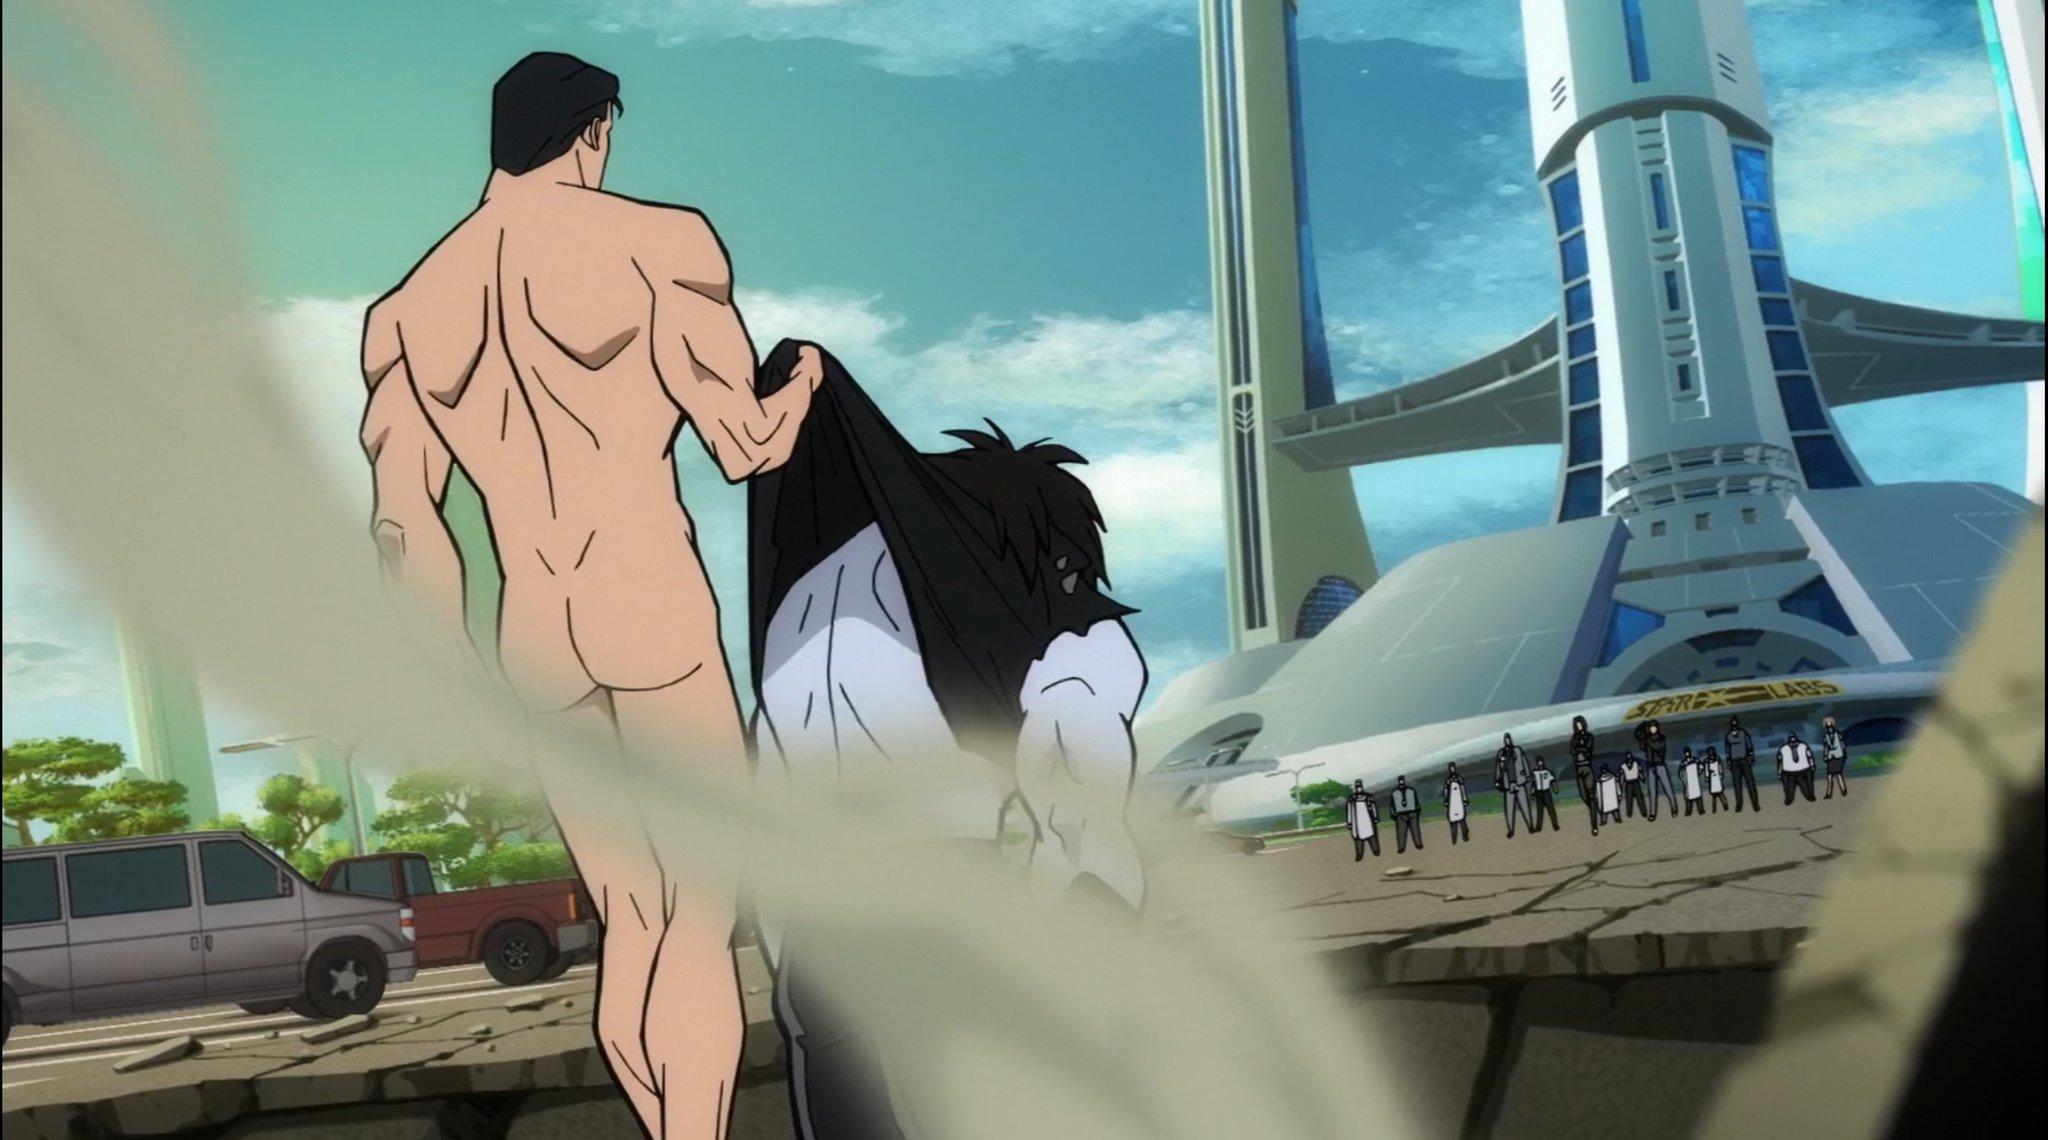 Nakedsupermen